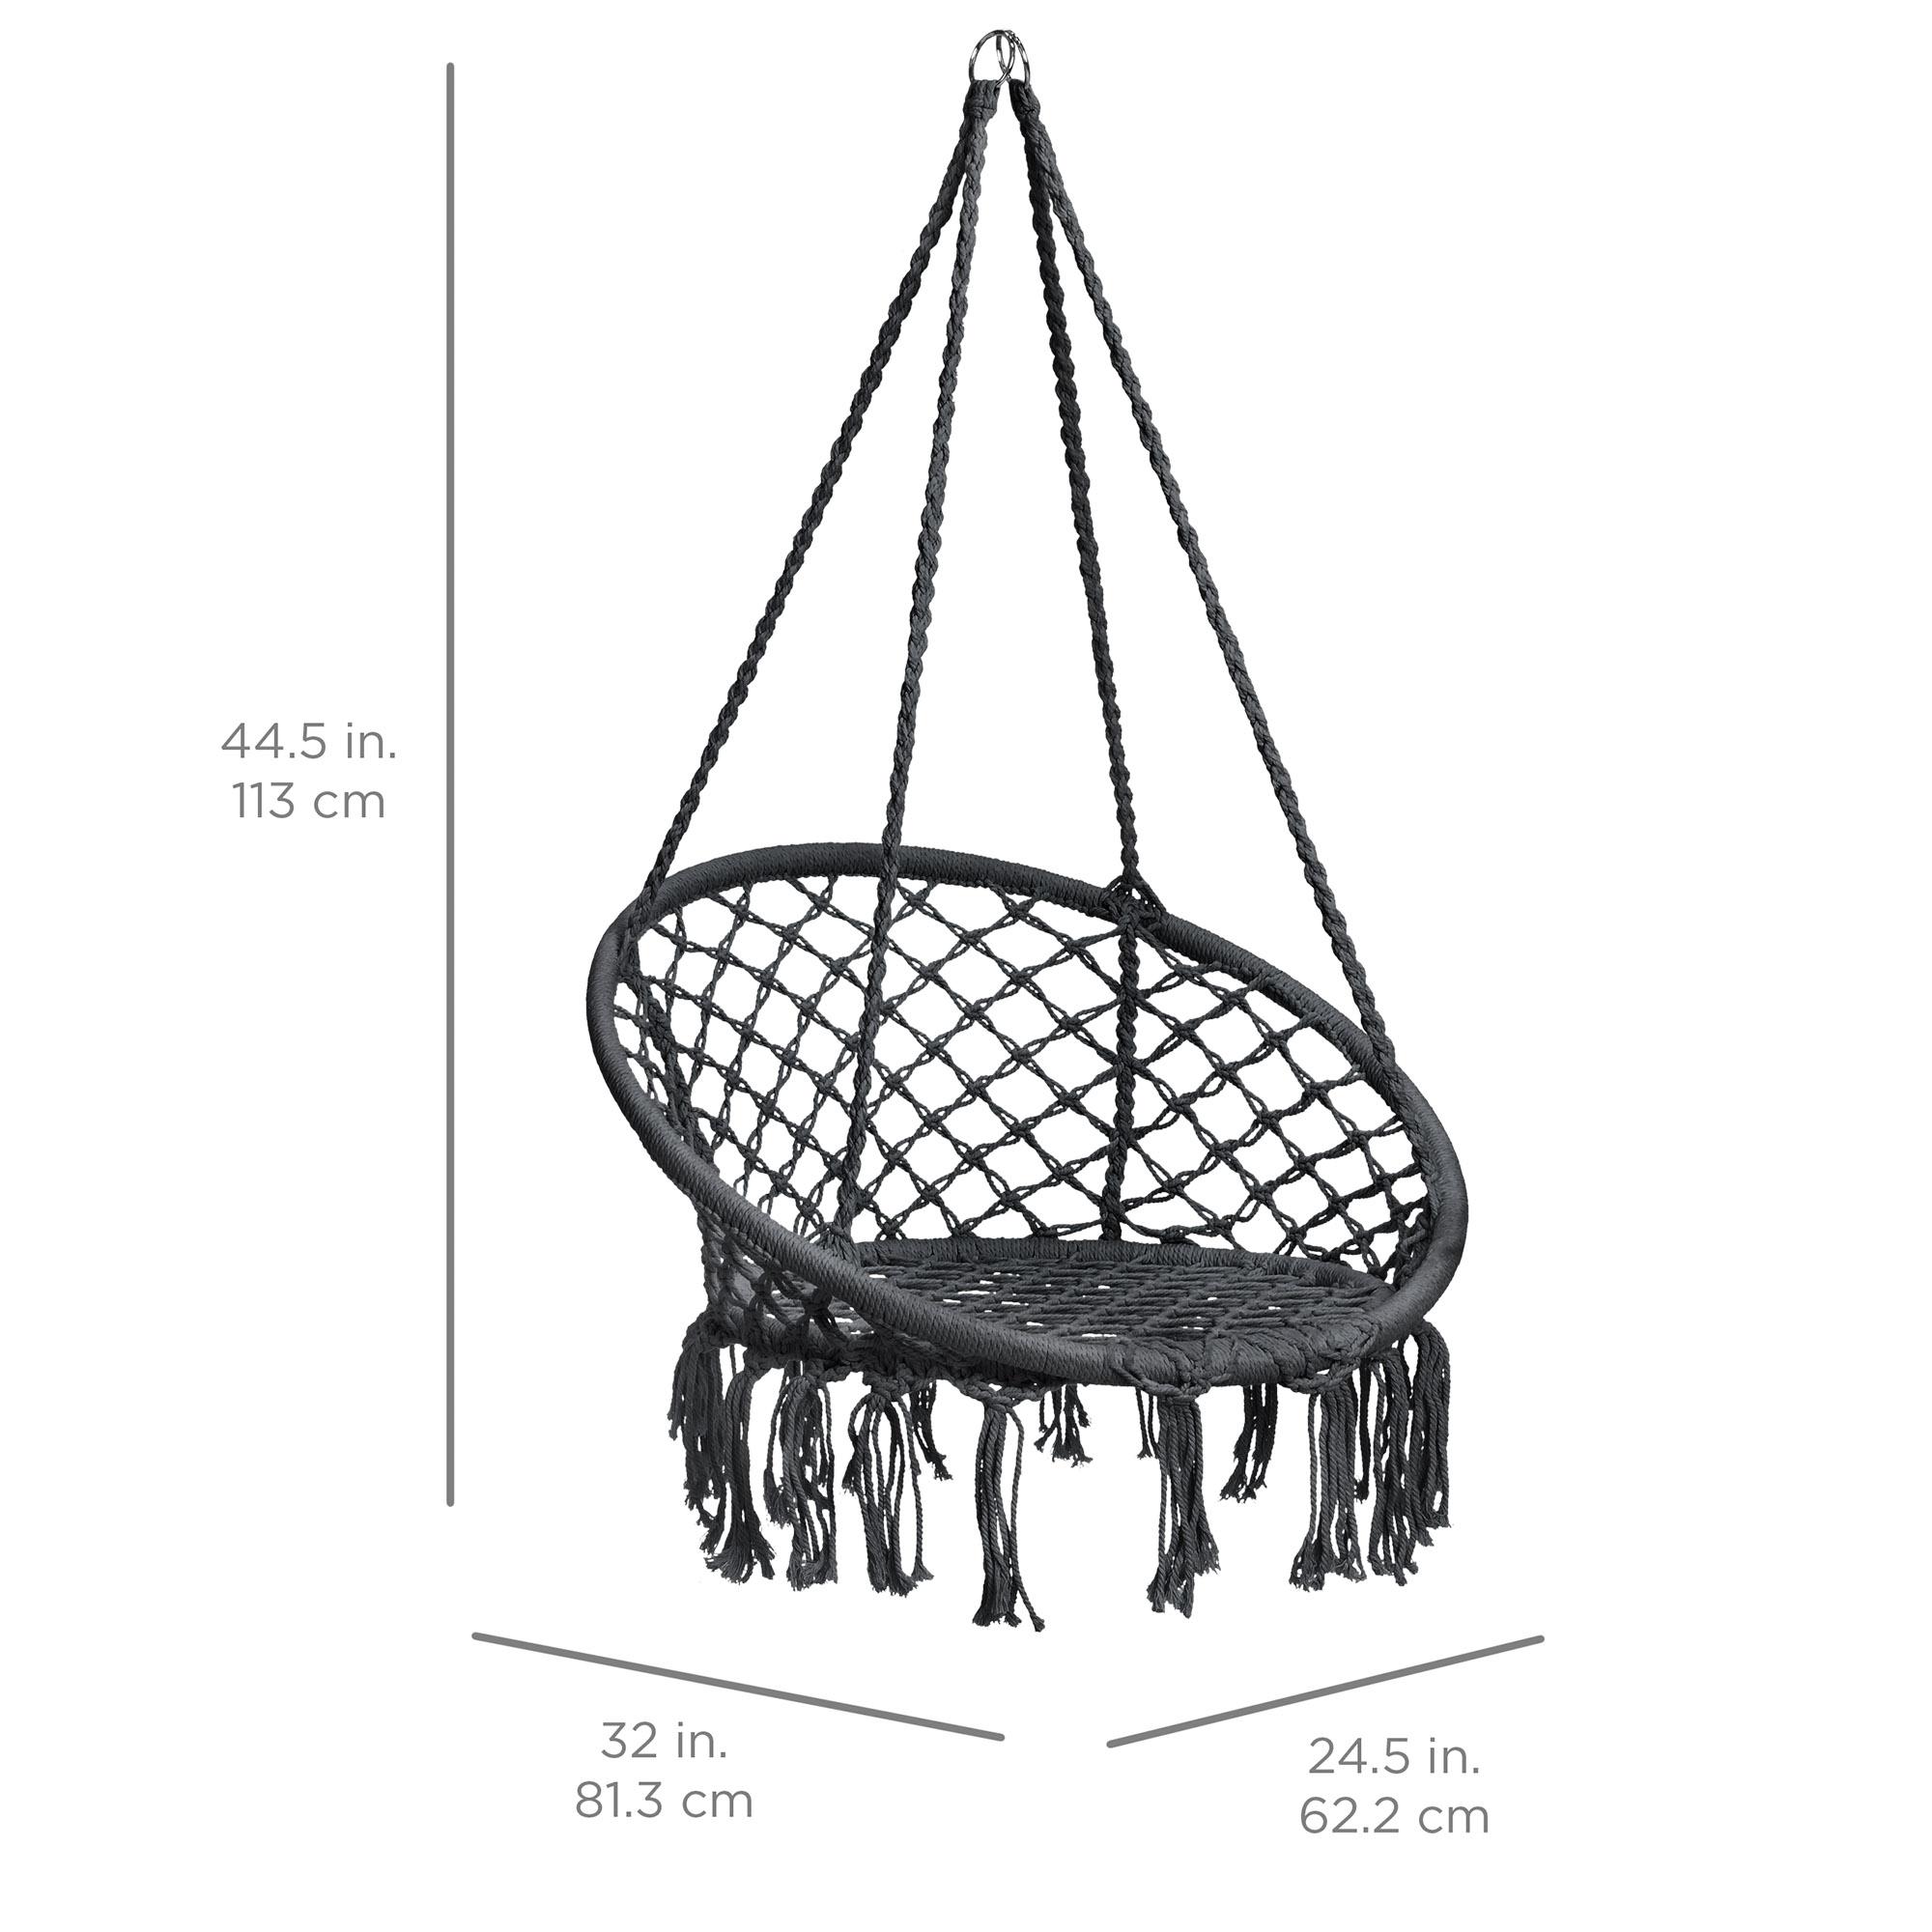 BCP-Handwoven-Cotton-Macrame-Hammock-Hanging-Chair-Swing-w-Backrest thumbnail 21